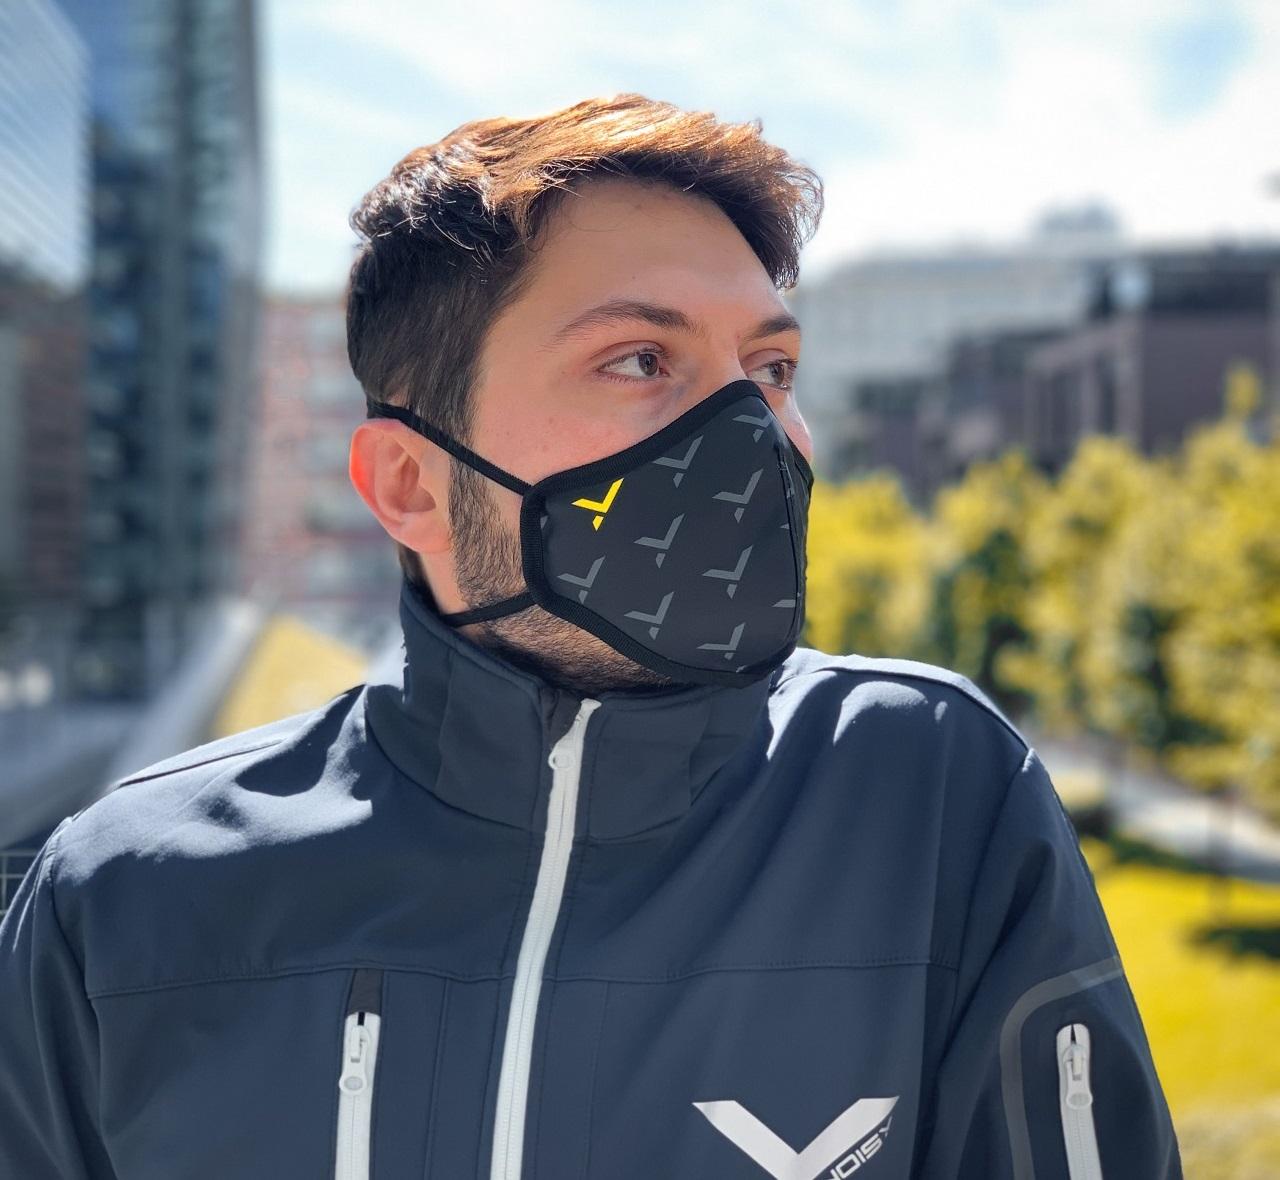 Noisy Mask: mascherine ad alto valore sociale